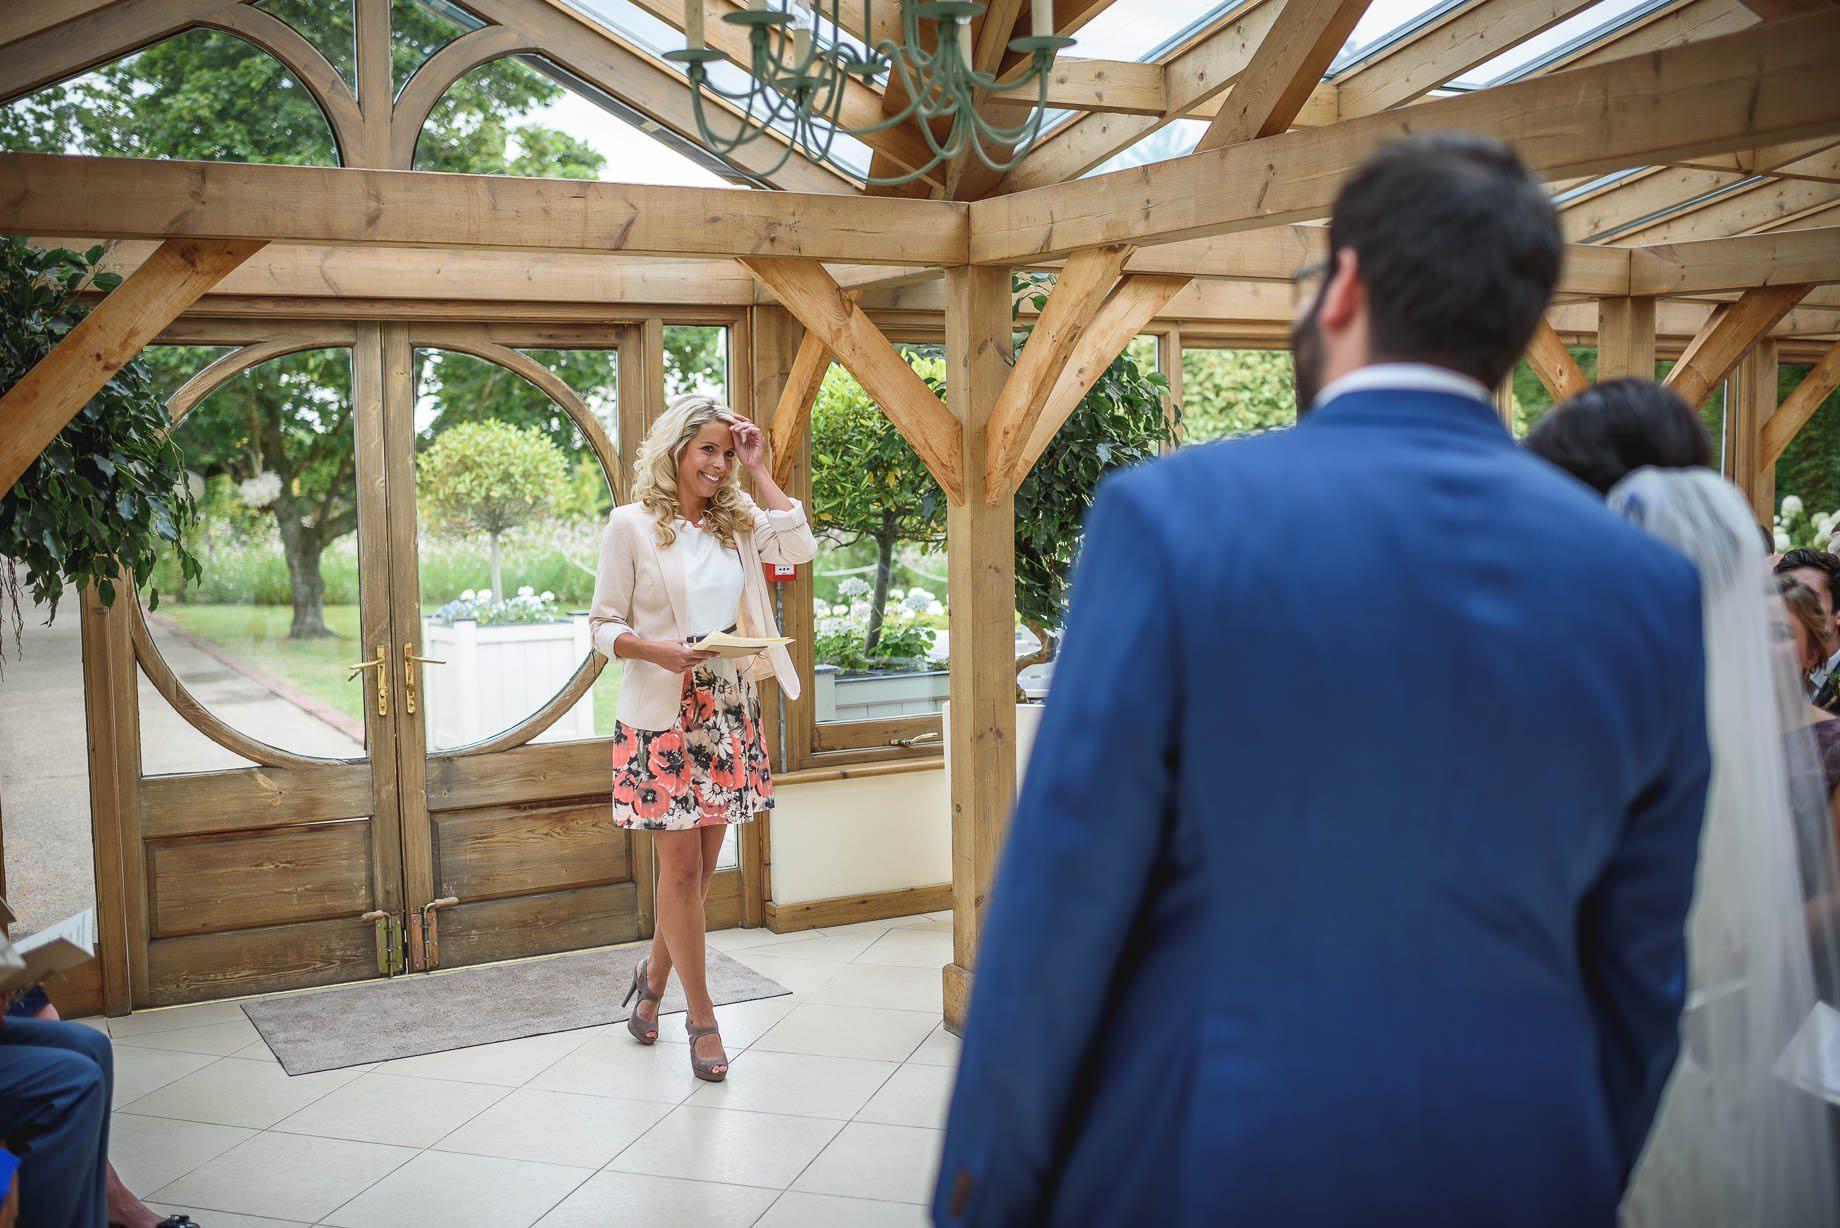 Gaynes Park wedding photography - Guy Collier Photography - Rachel and Jon (68 of 169)